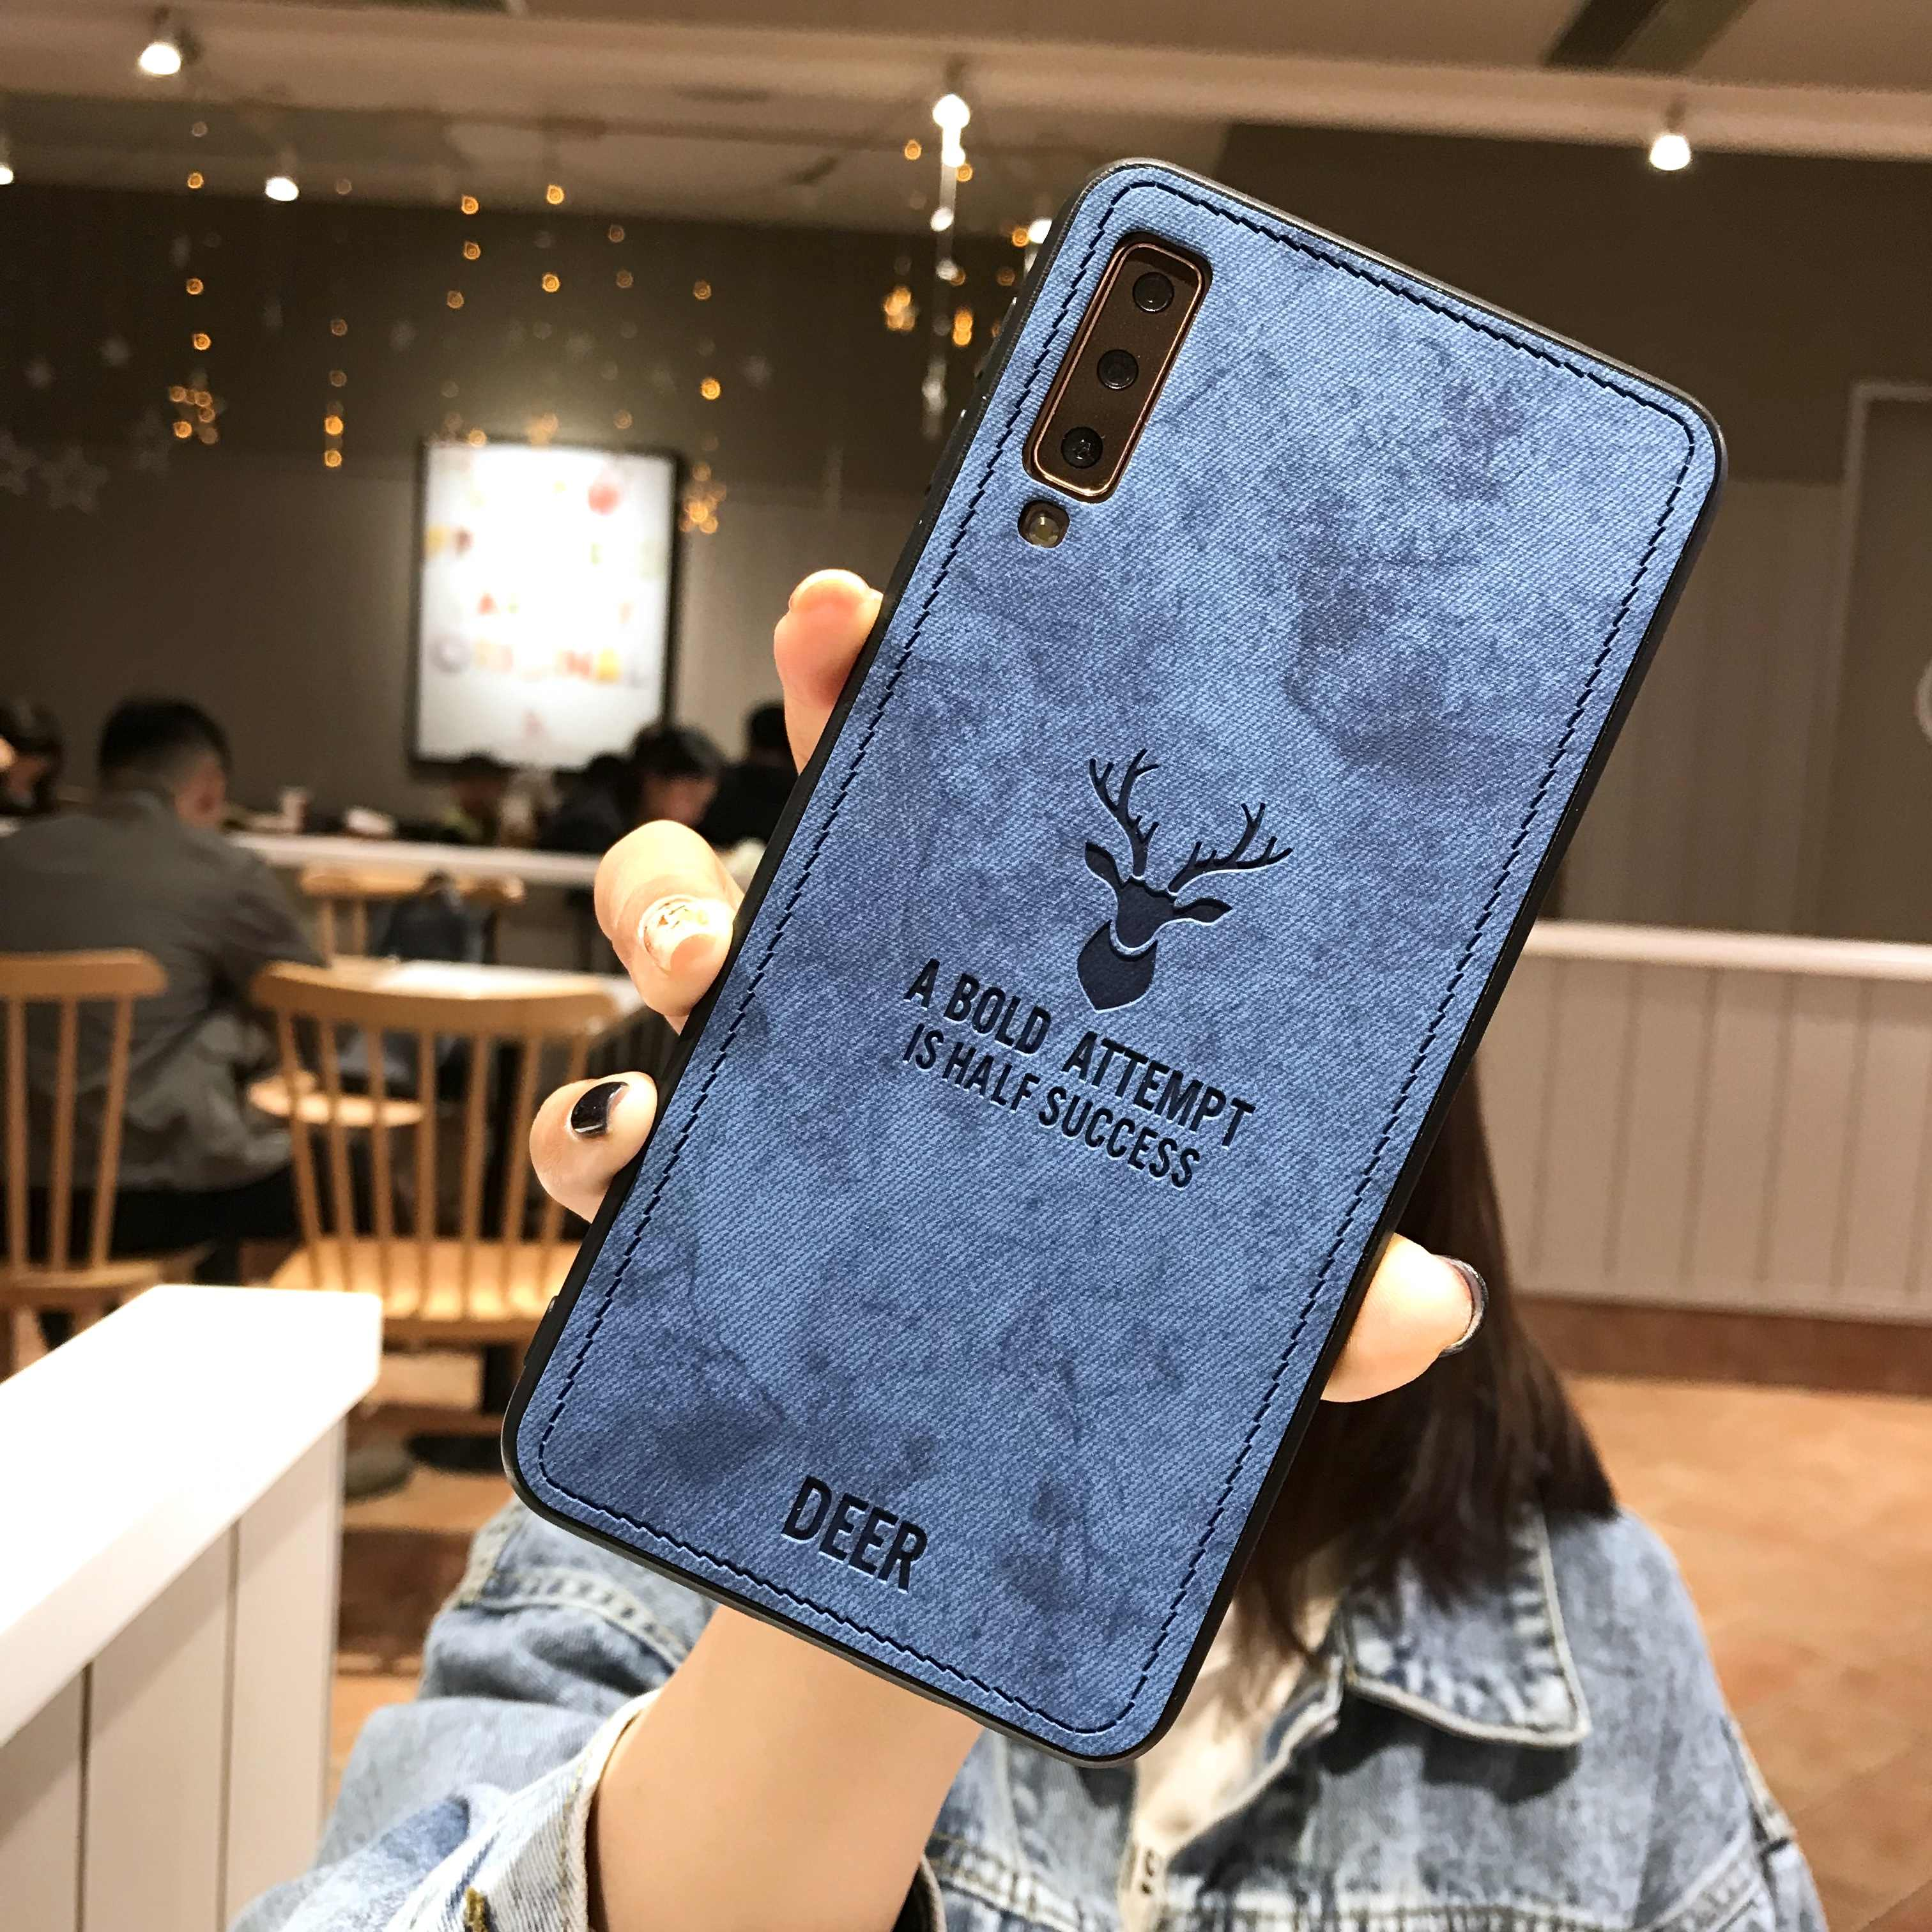 Rusa Kain untuk Huawei P30 P20 Pro P20 Lite P10 Mate 20 10 Nova 4 3 3i Kehormatan 10 9 8 7C 8X 7X Cover Kulit + Case Silikon